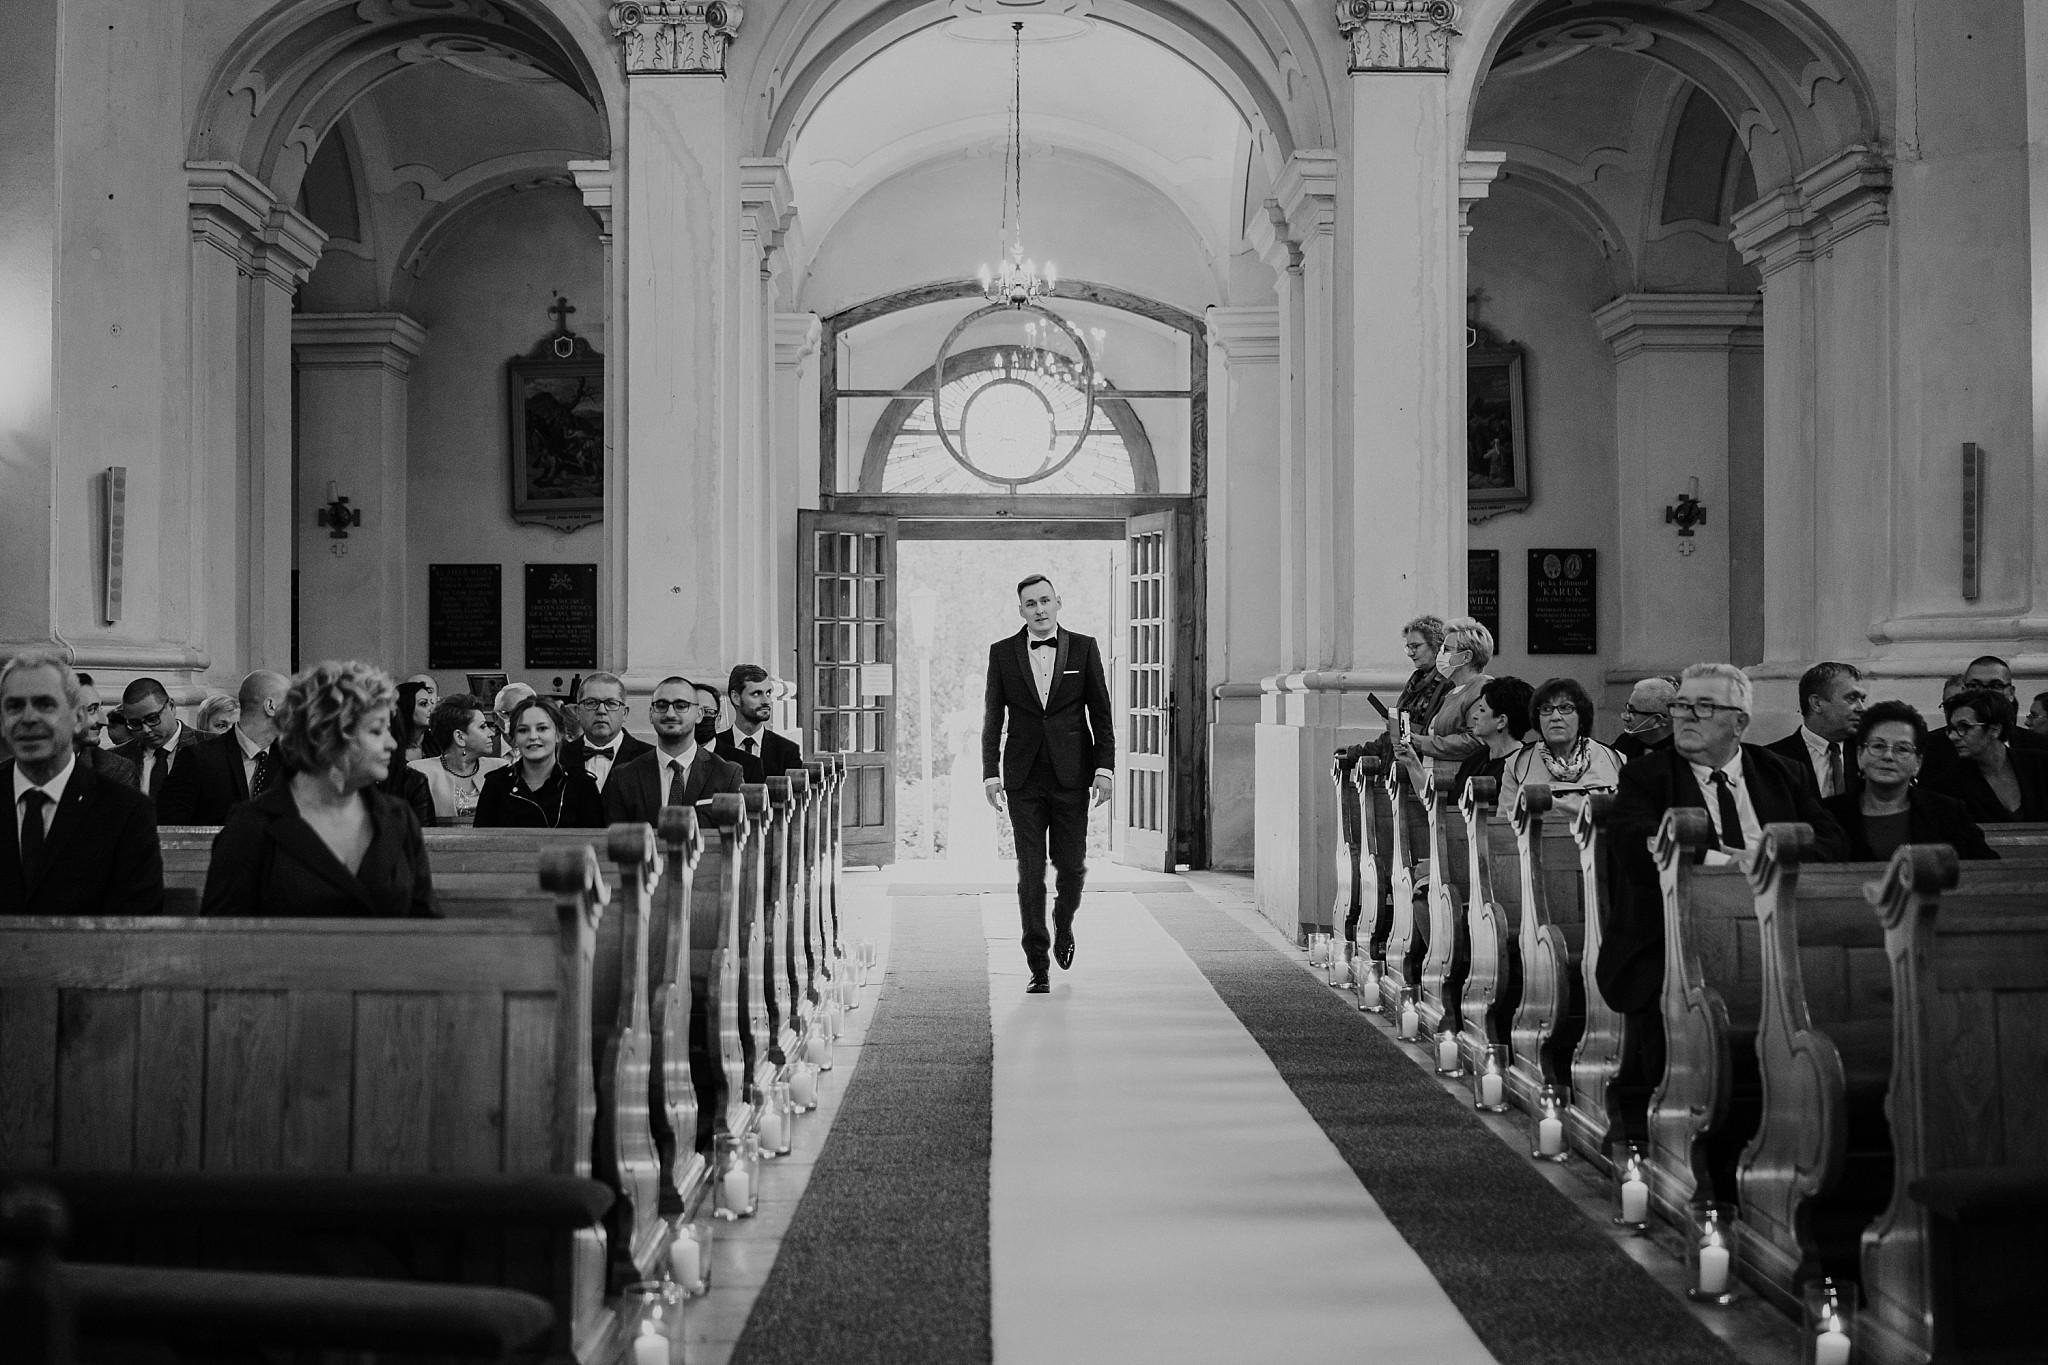 fotograf poznan wesele dobra truskawka piekne wesele pod poznaniem wesele w dobrej truskawce piekna para mloda slub marzen slub koronawirus slub listopad wesele koronawirus 141